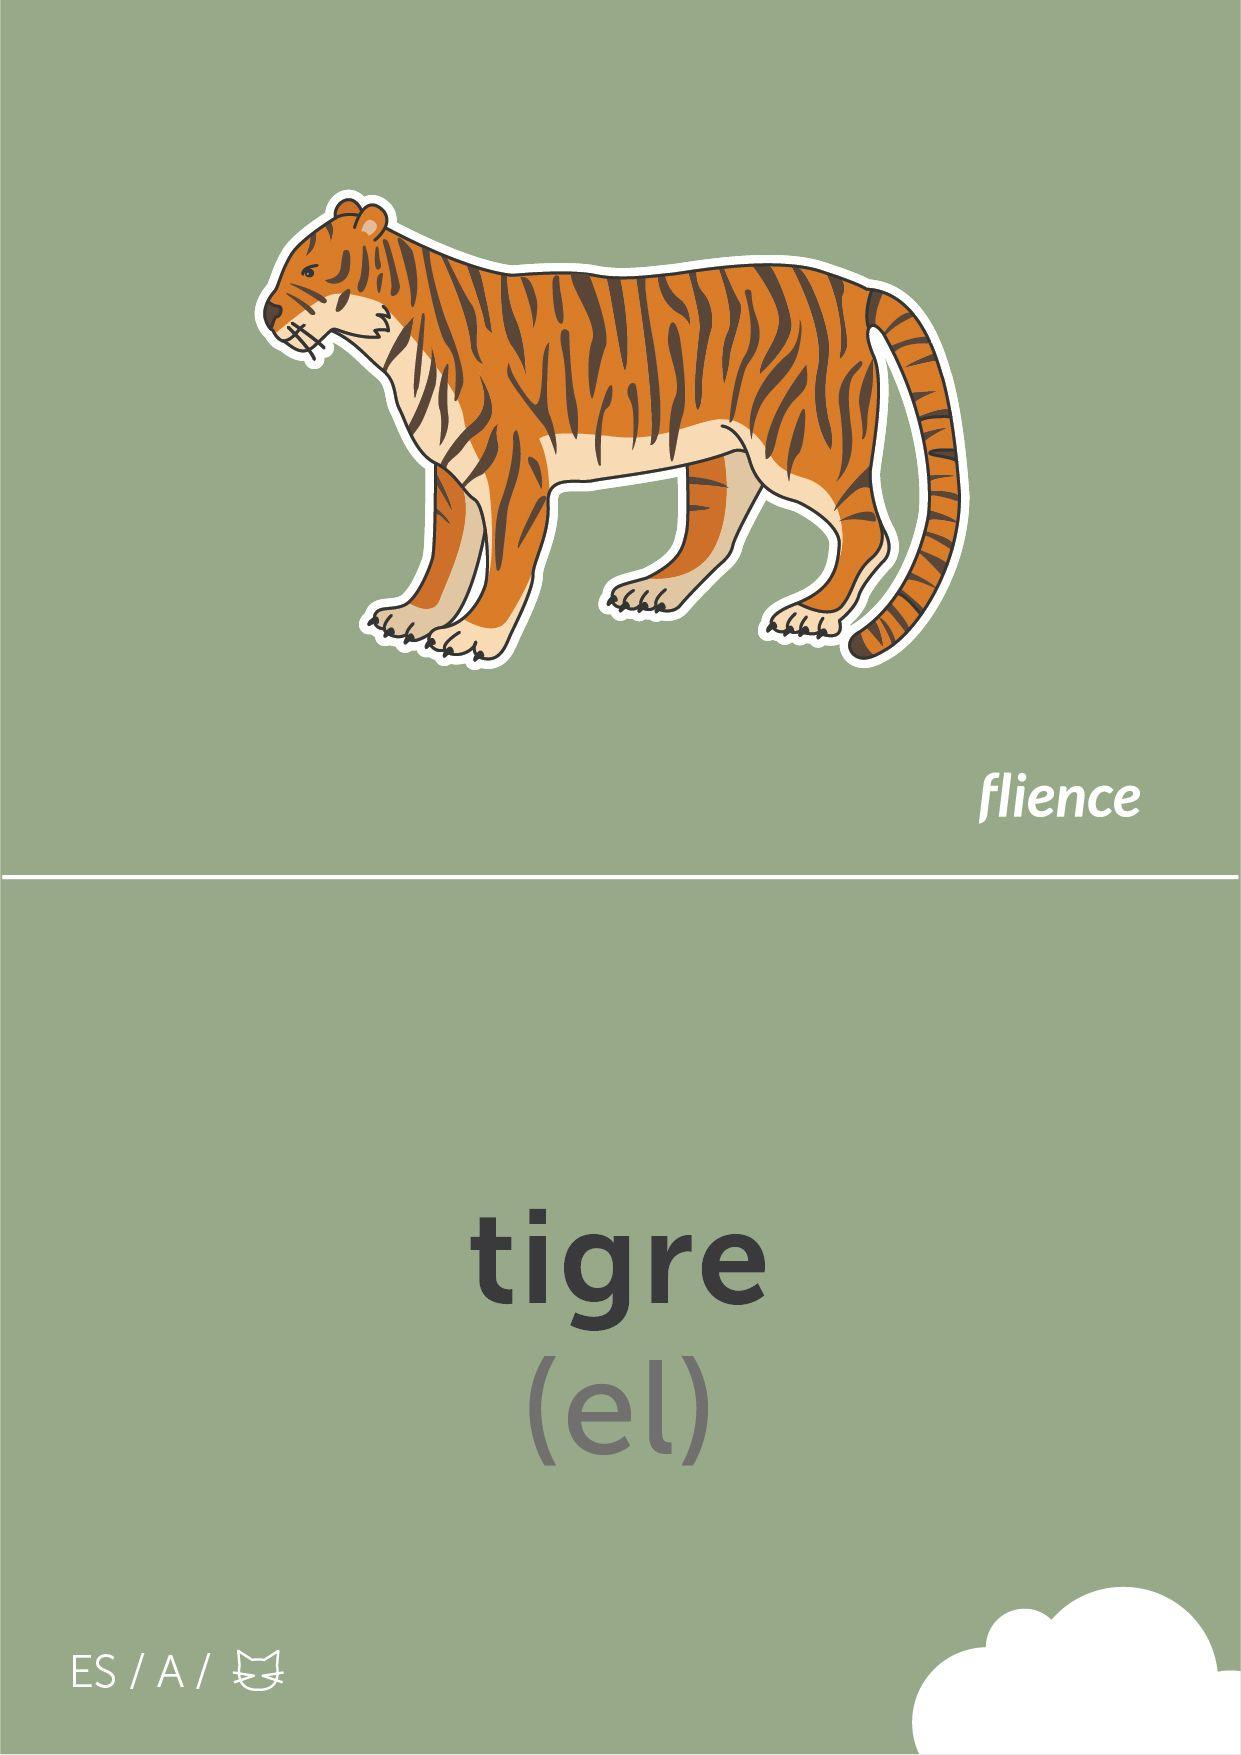 Tigre Cardfly Flience Animals Spanish Education Flashcard Language Tygrys Wloski Design